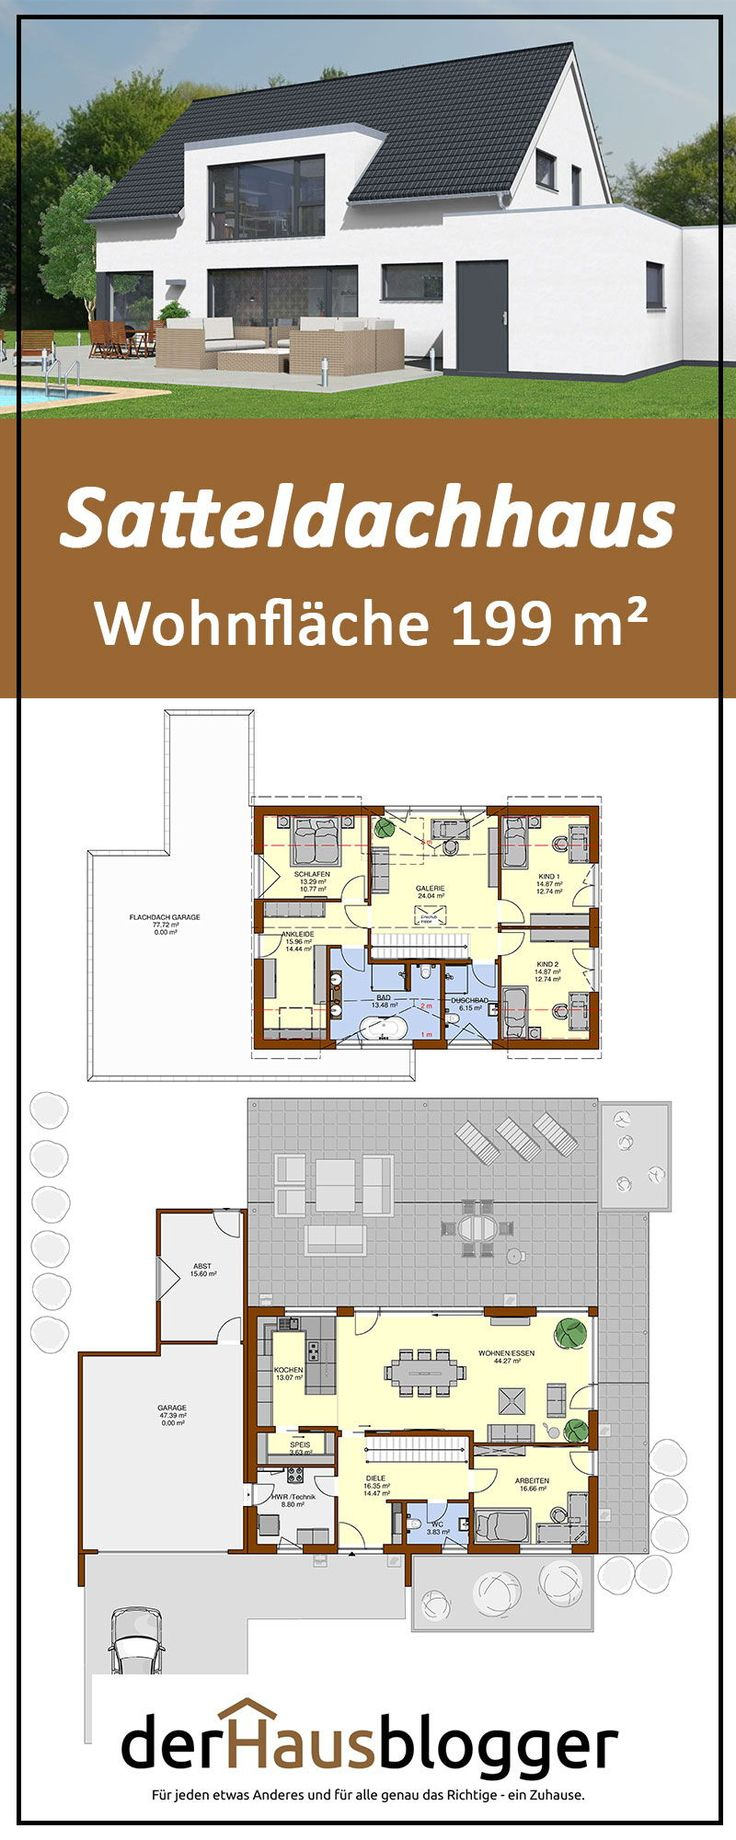 Satteldachhaus 199m²